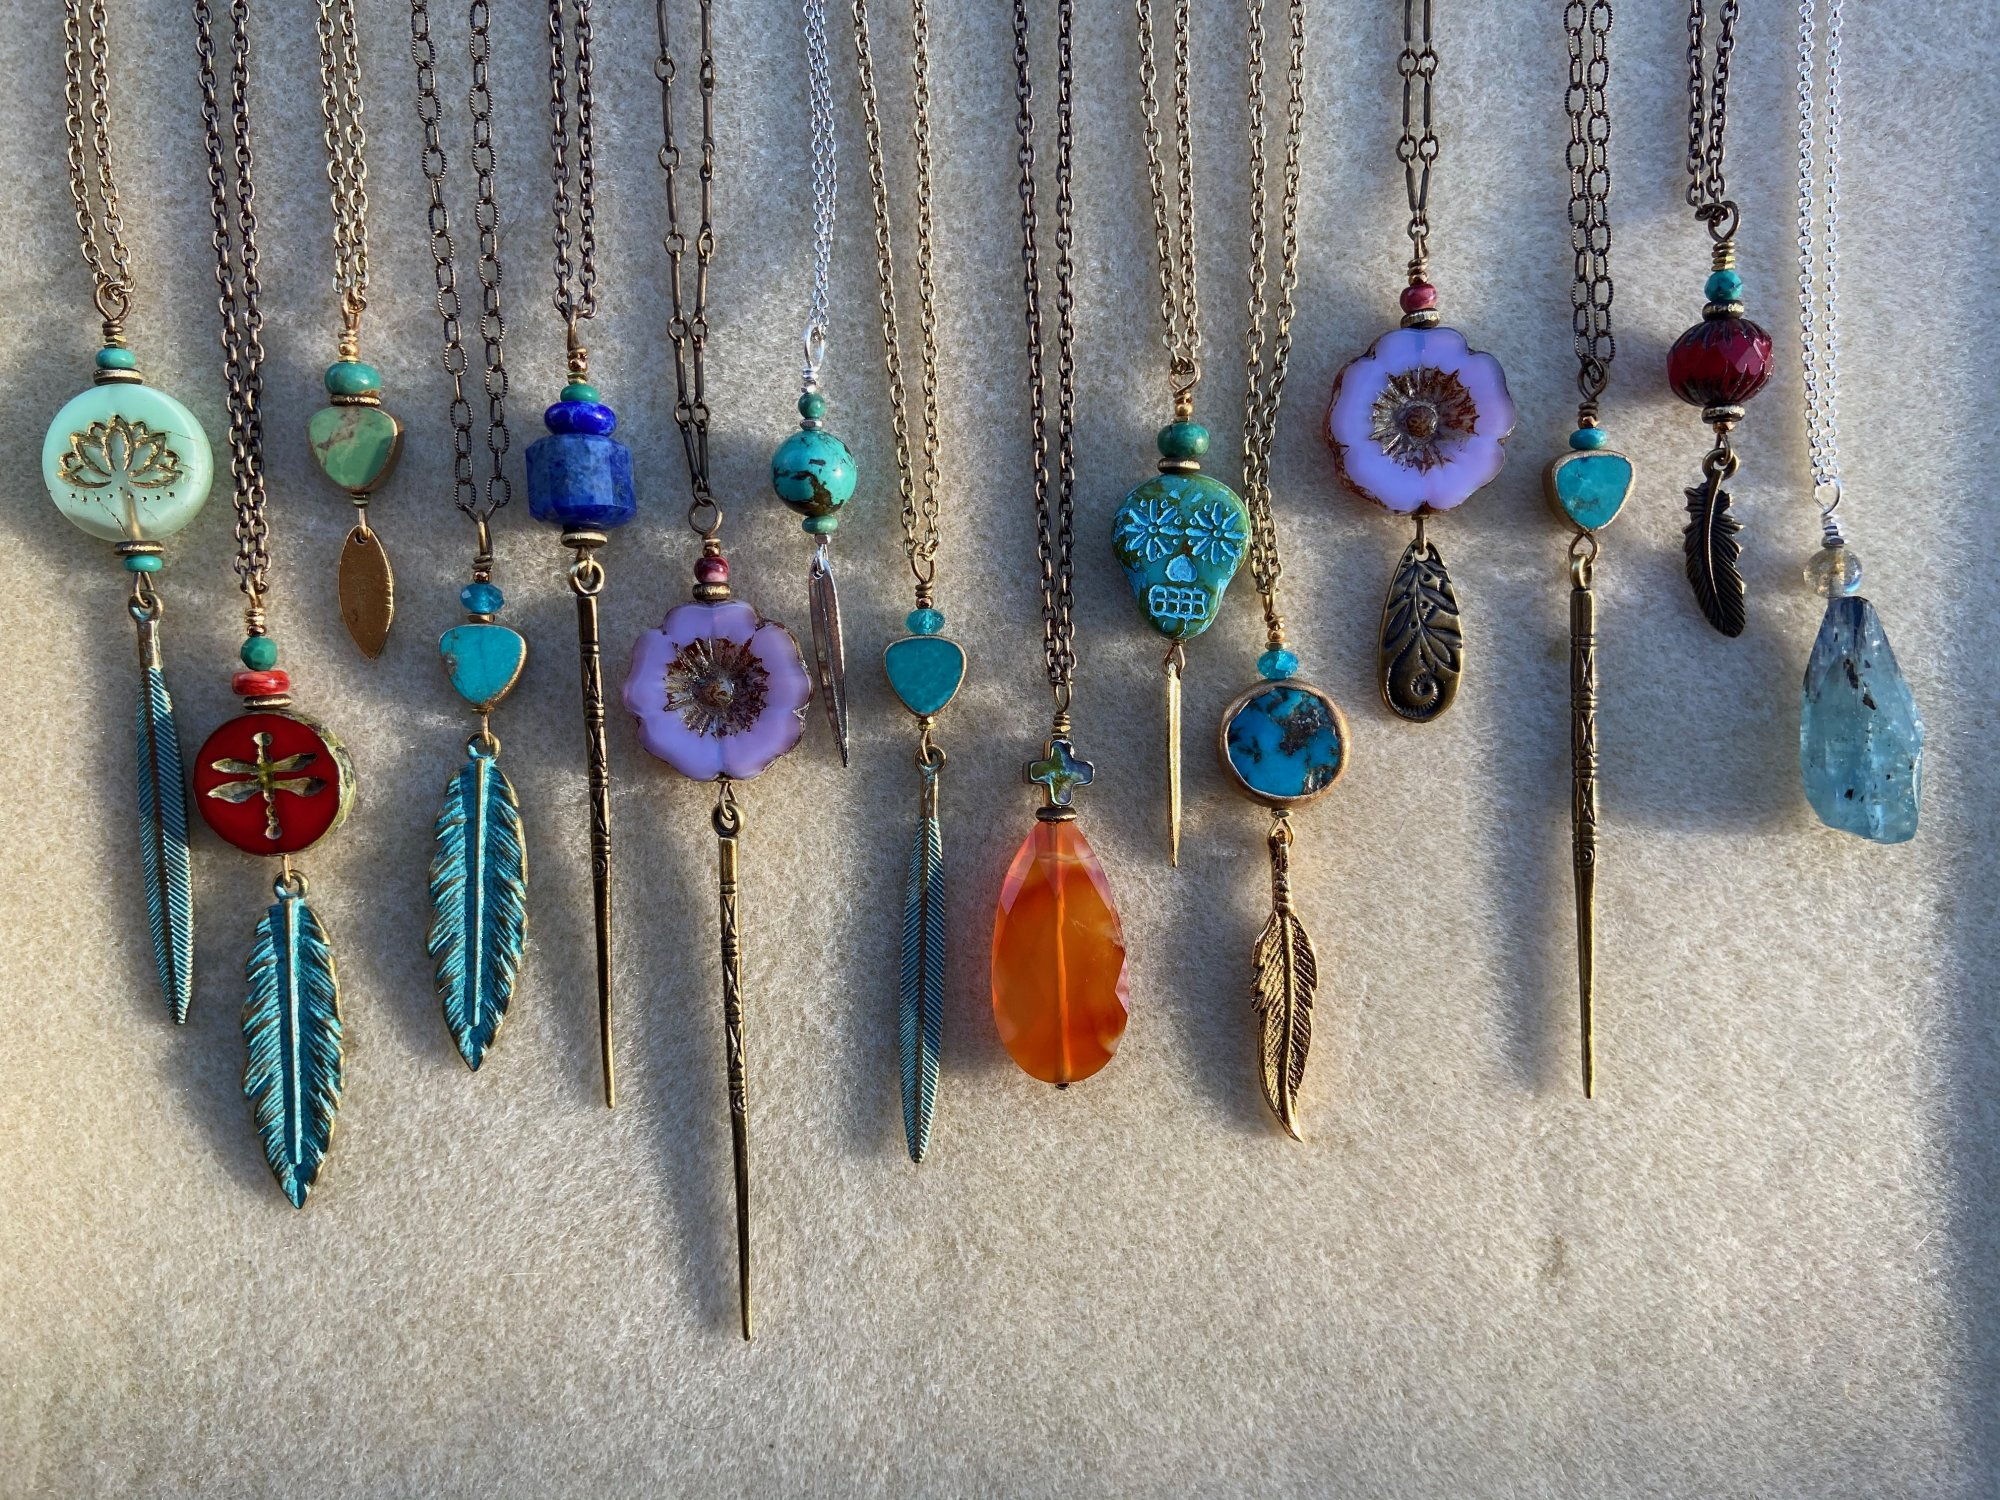 Boho Chain Necklace w/ Pendant (SJC)